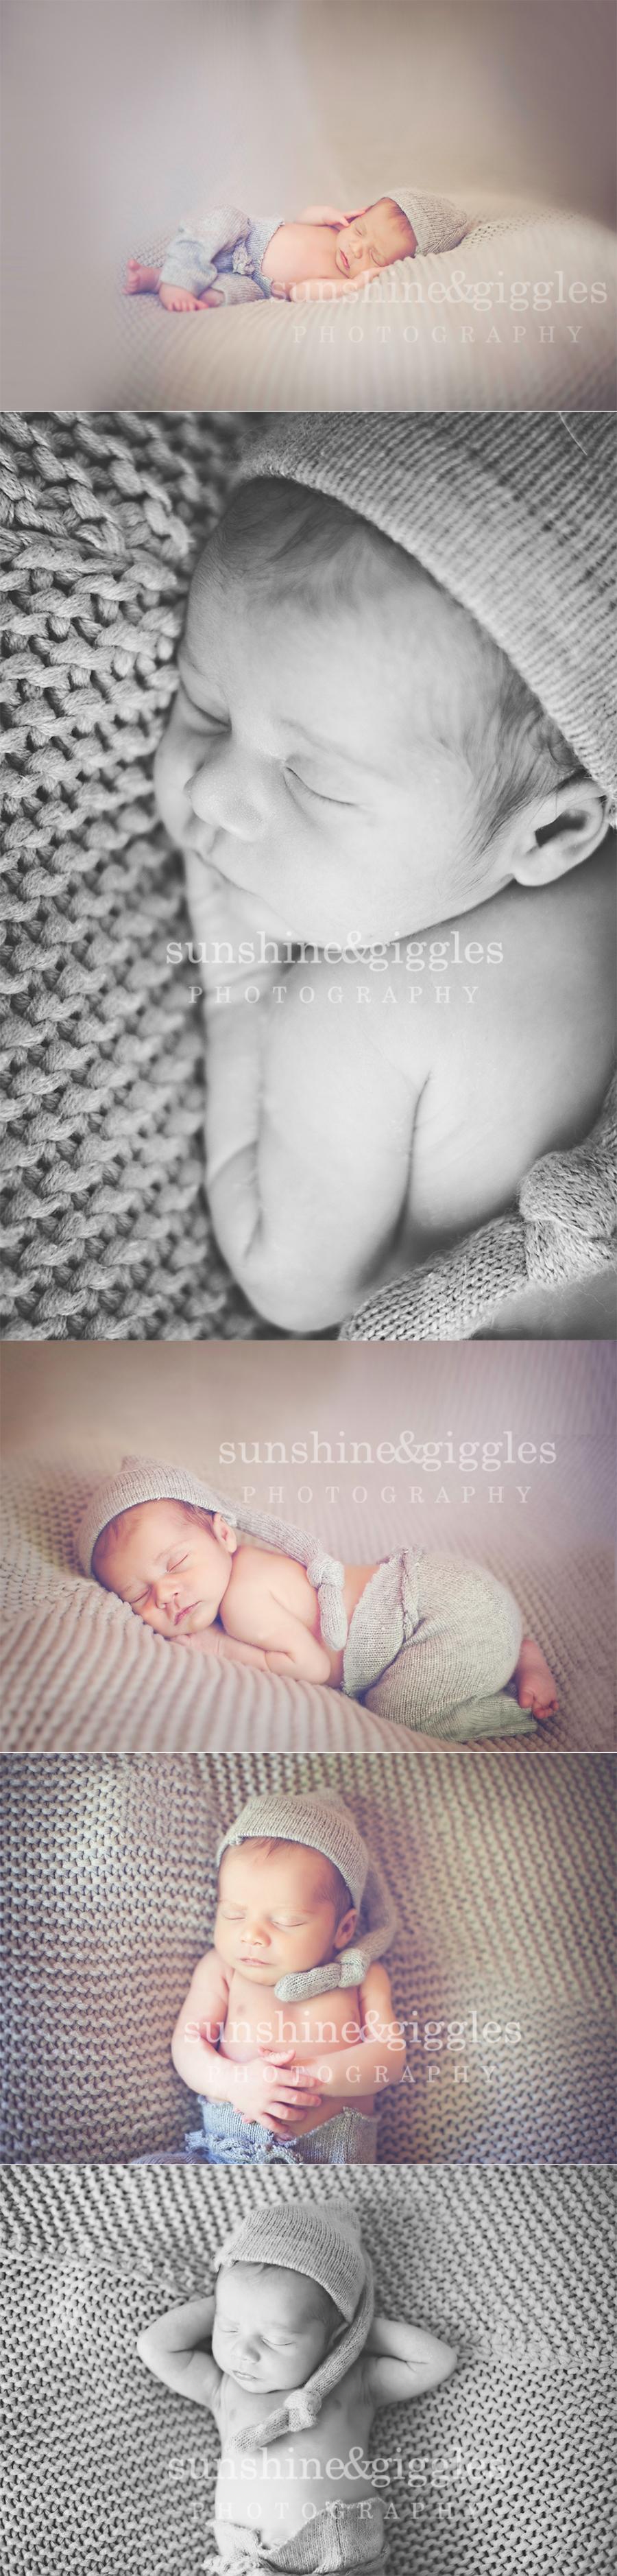 Central-New-Jersey-Newborn-Photographer1.jpg